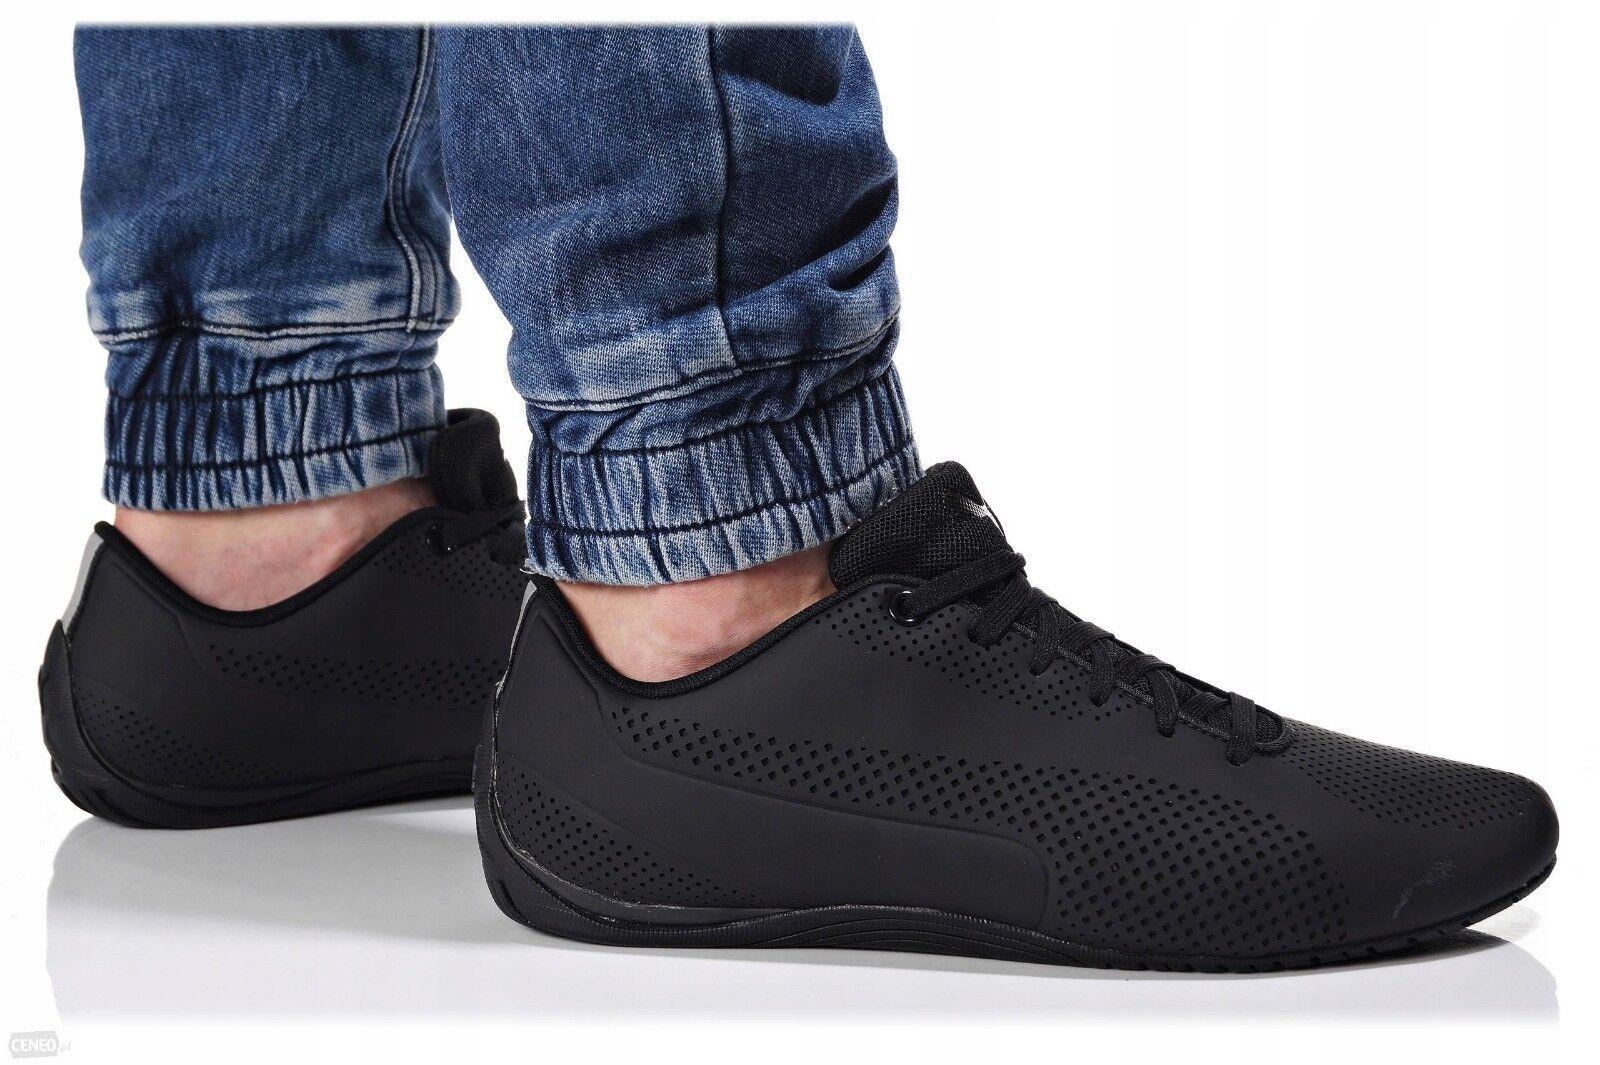 PUMA Drift Cat Ultra Reflective Men s Shoes Men Low Boot Sport ... 0bcc45037